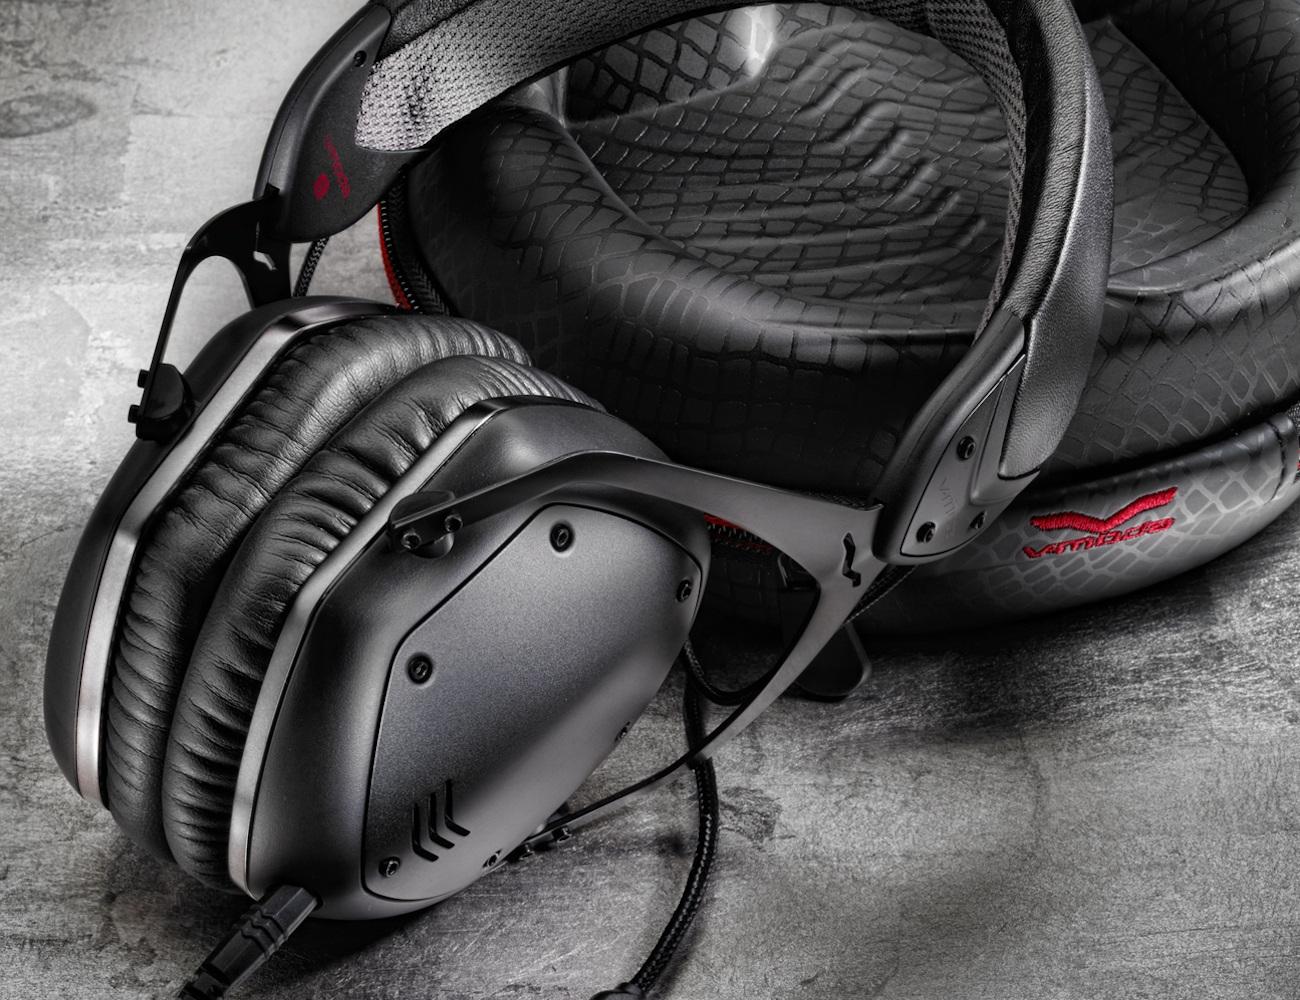 V-MODA Crossfade 2 Wireless Headphones